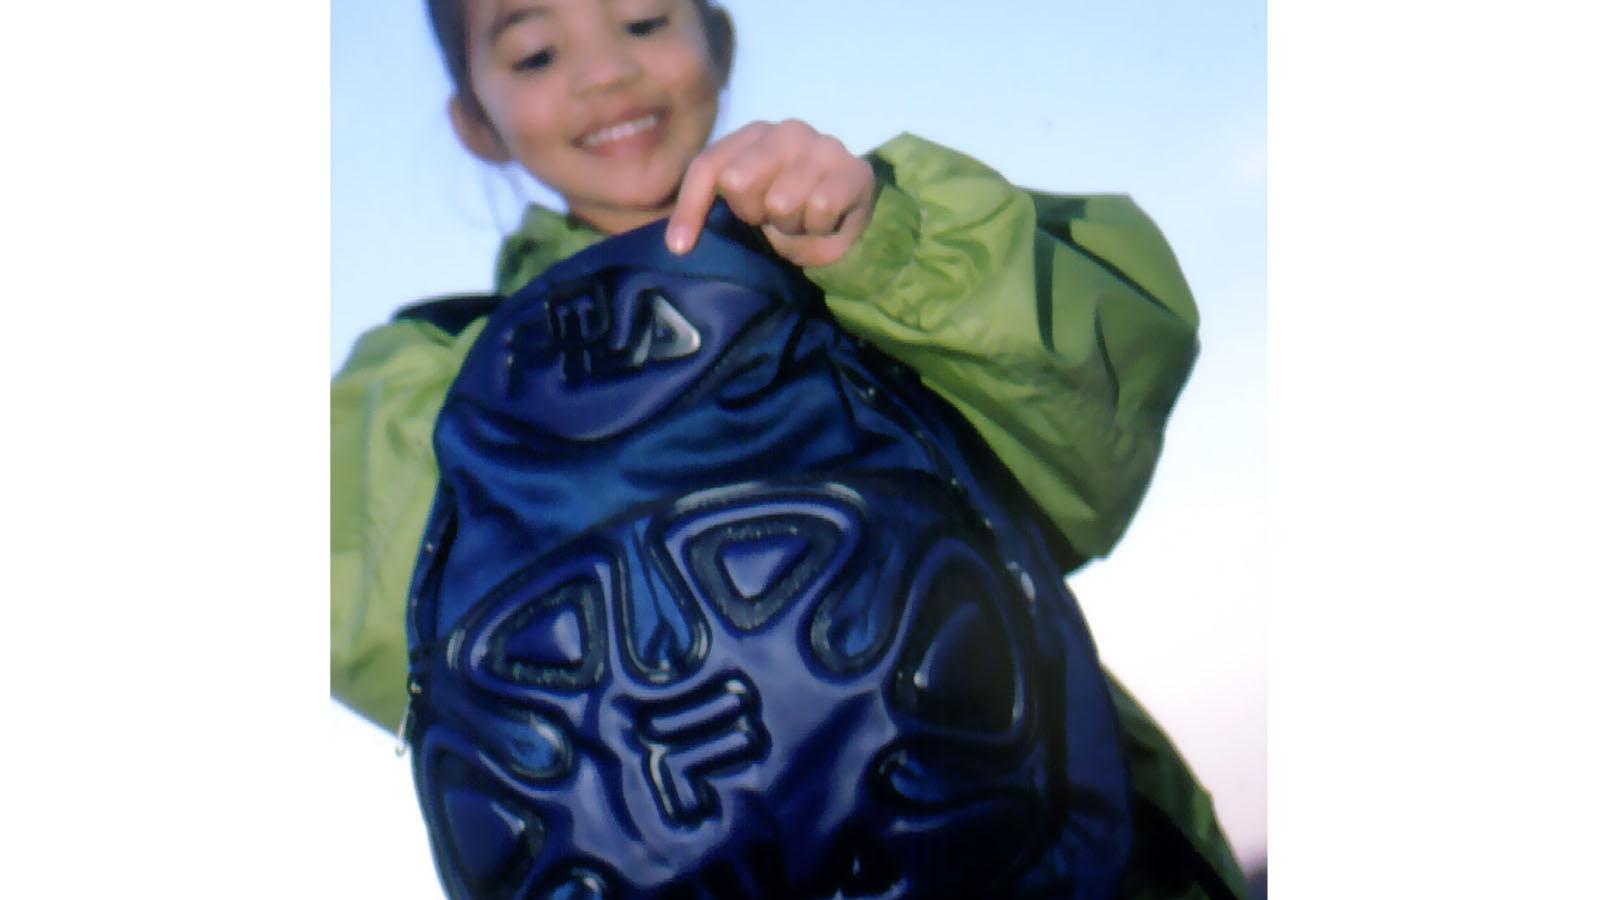 zaino-backpackaging-system-fila-bambina